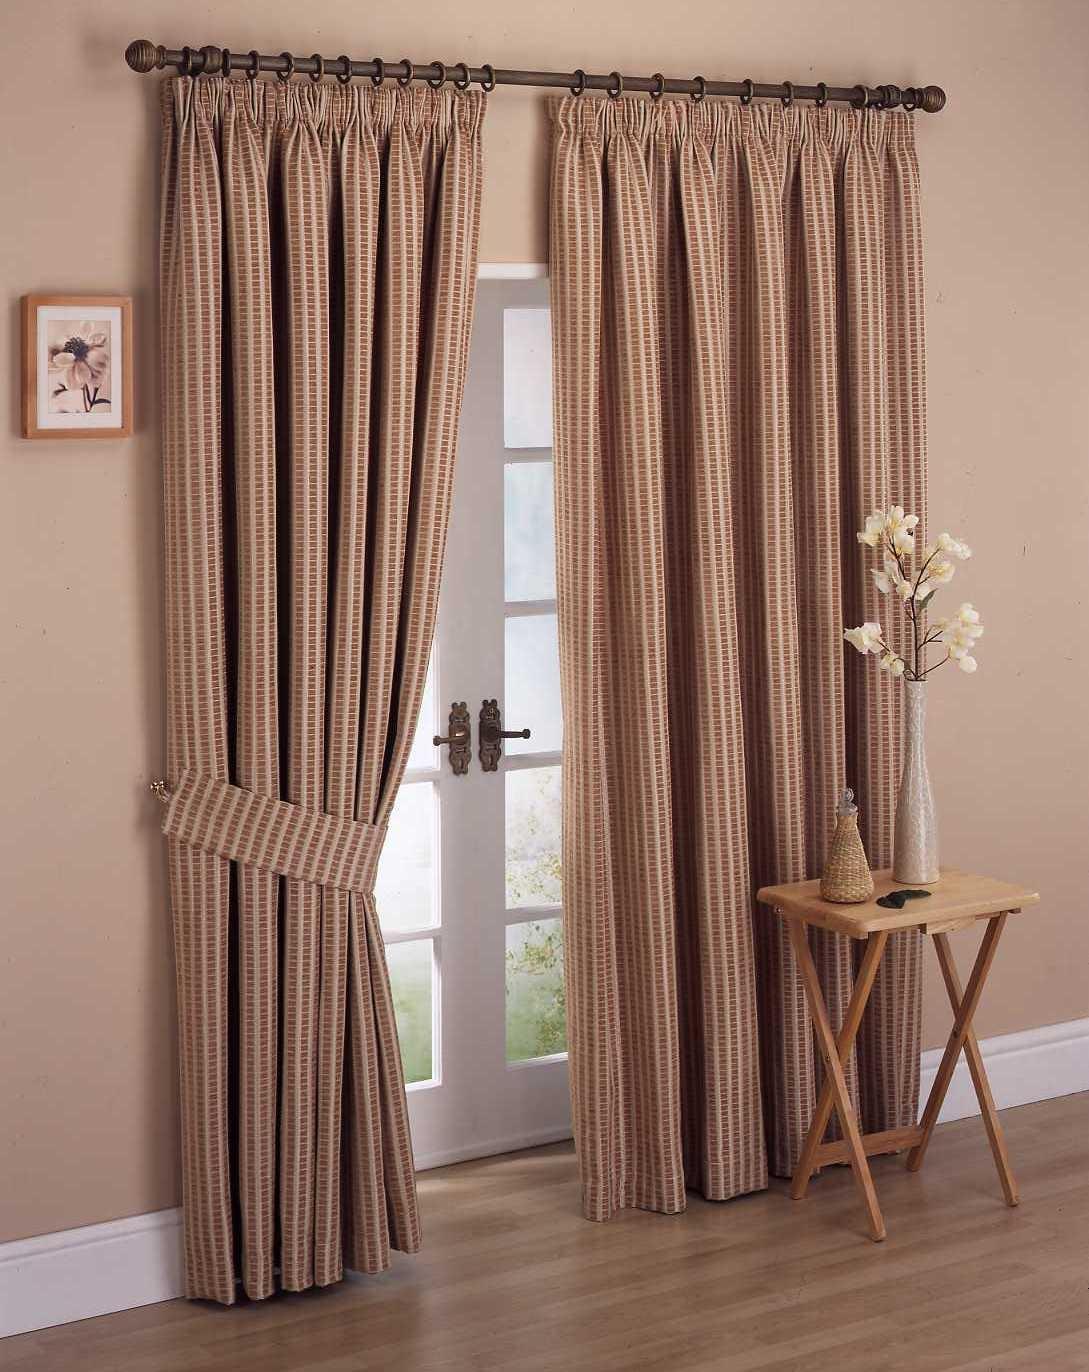 Fresh Door Curtain Panel 72 18021 With Doorway Curtains (View 18 of 25)